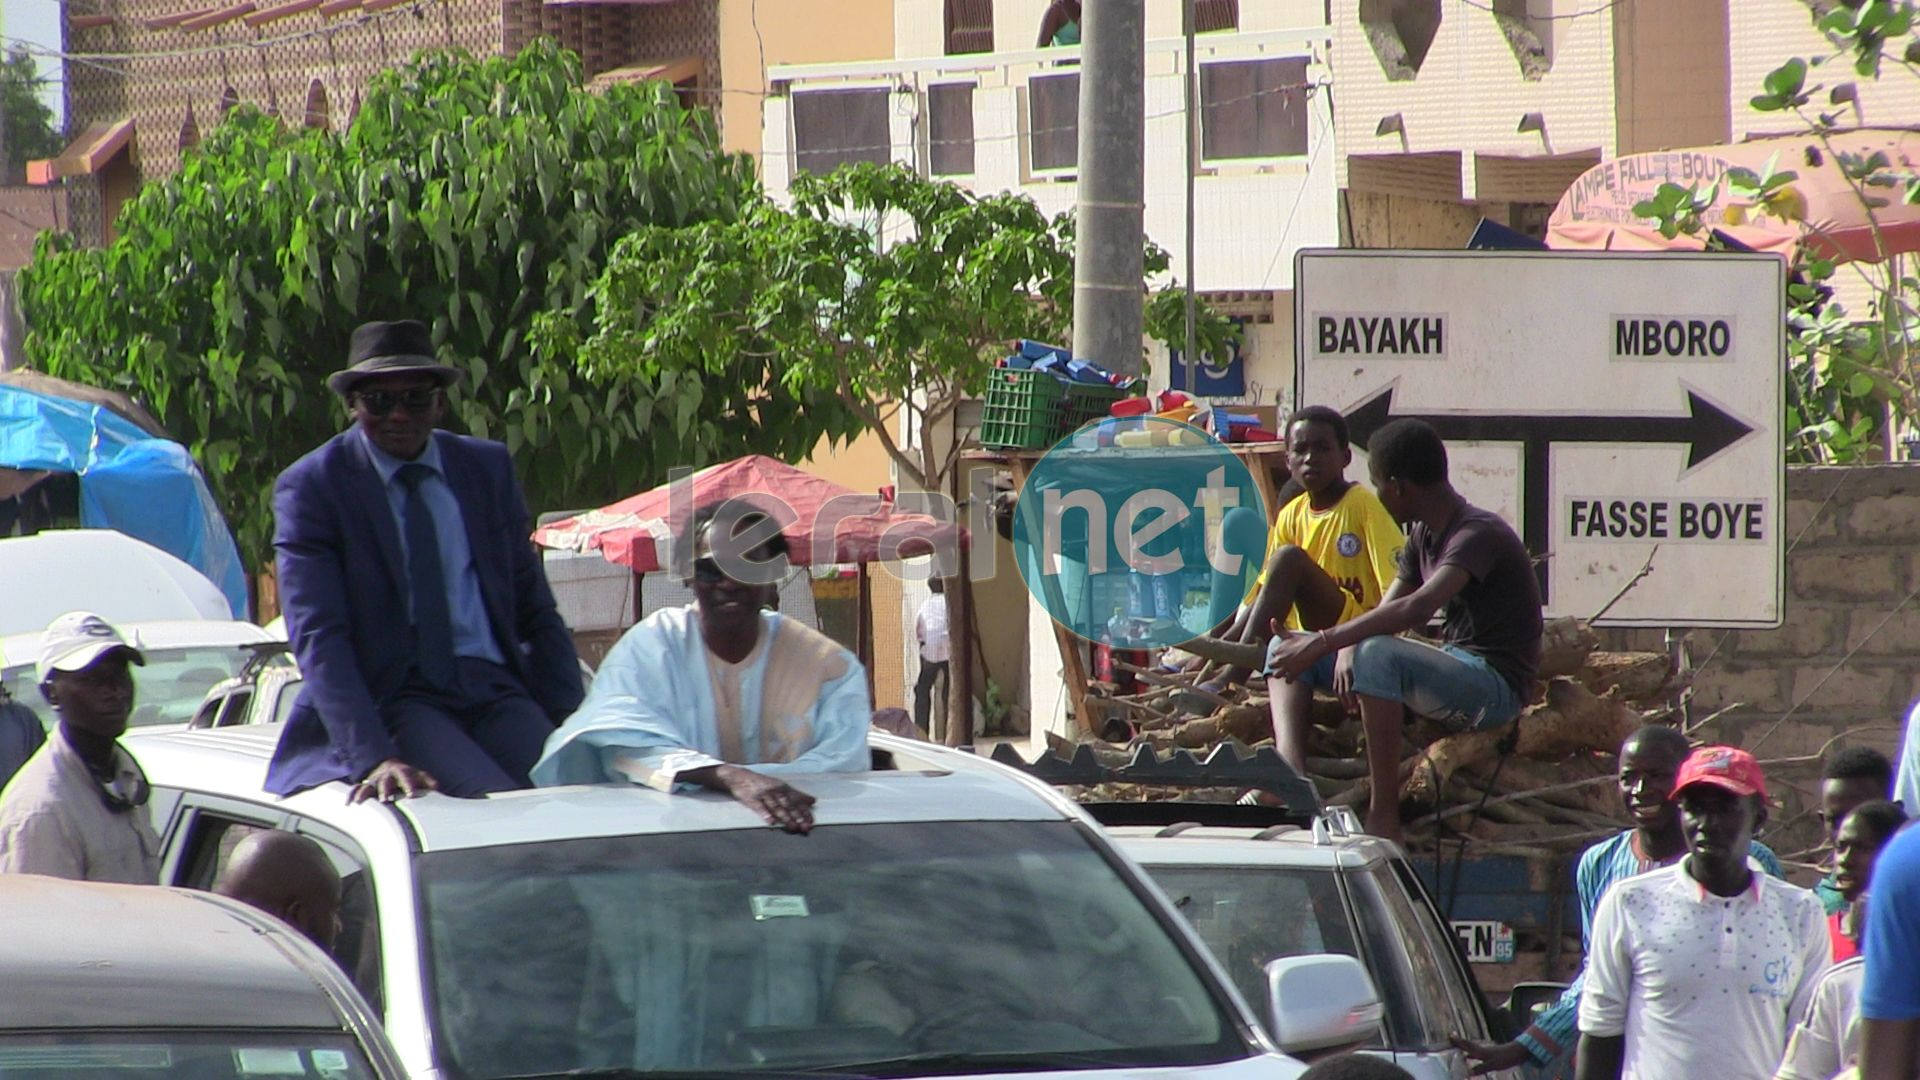 Vidéo-Photos: Baaba Maal en tournée avec son mouvement, Nann-k